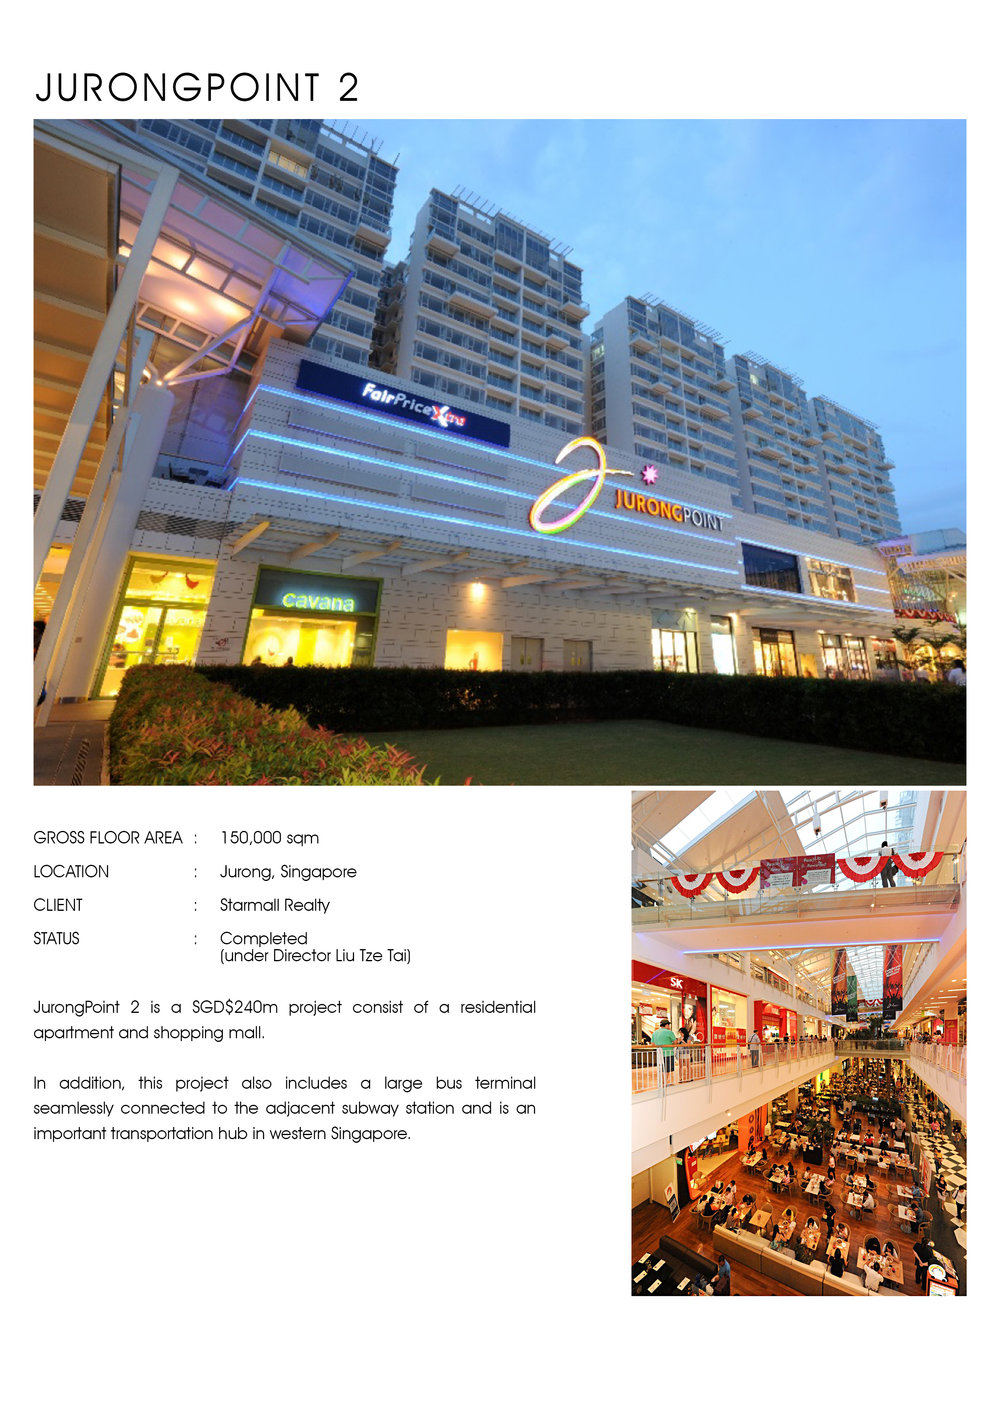 16_Jurongpoint2_en.jpg